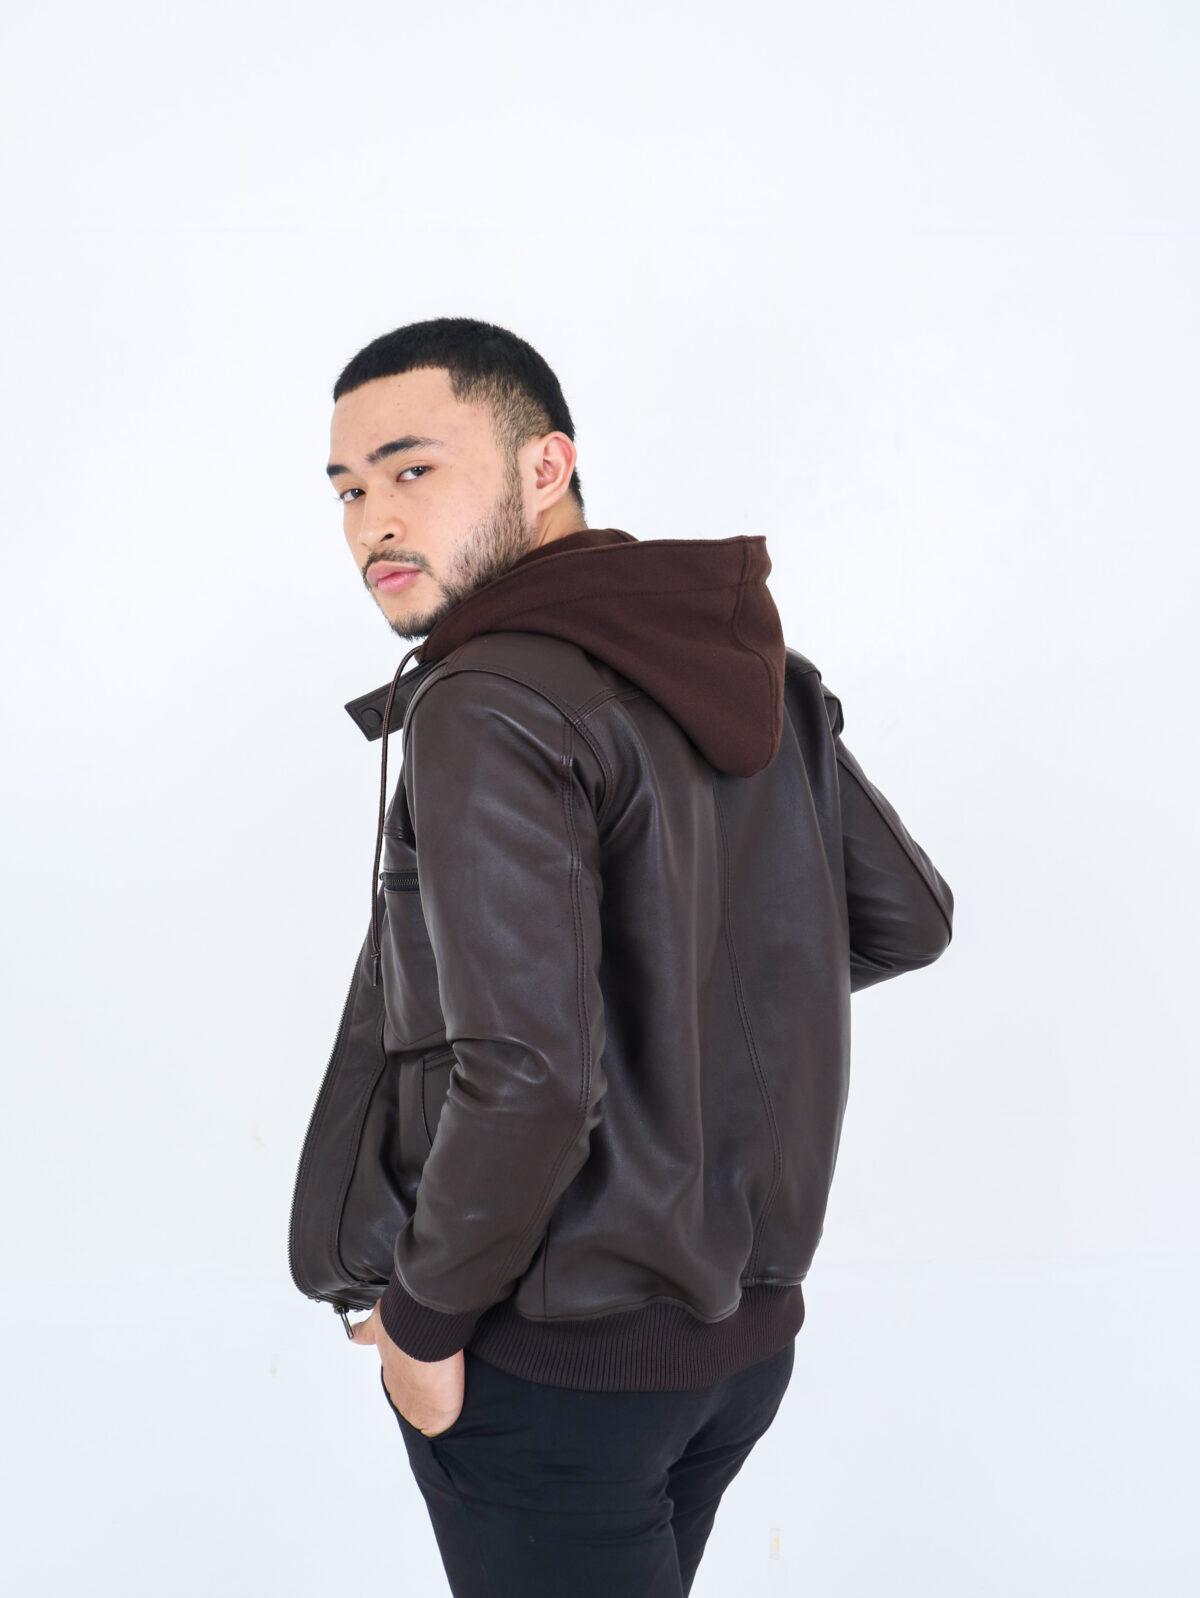 Blankenheim Leather Jacket Eckhard – Brown (Size S M L XL)